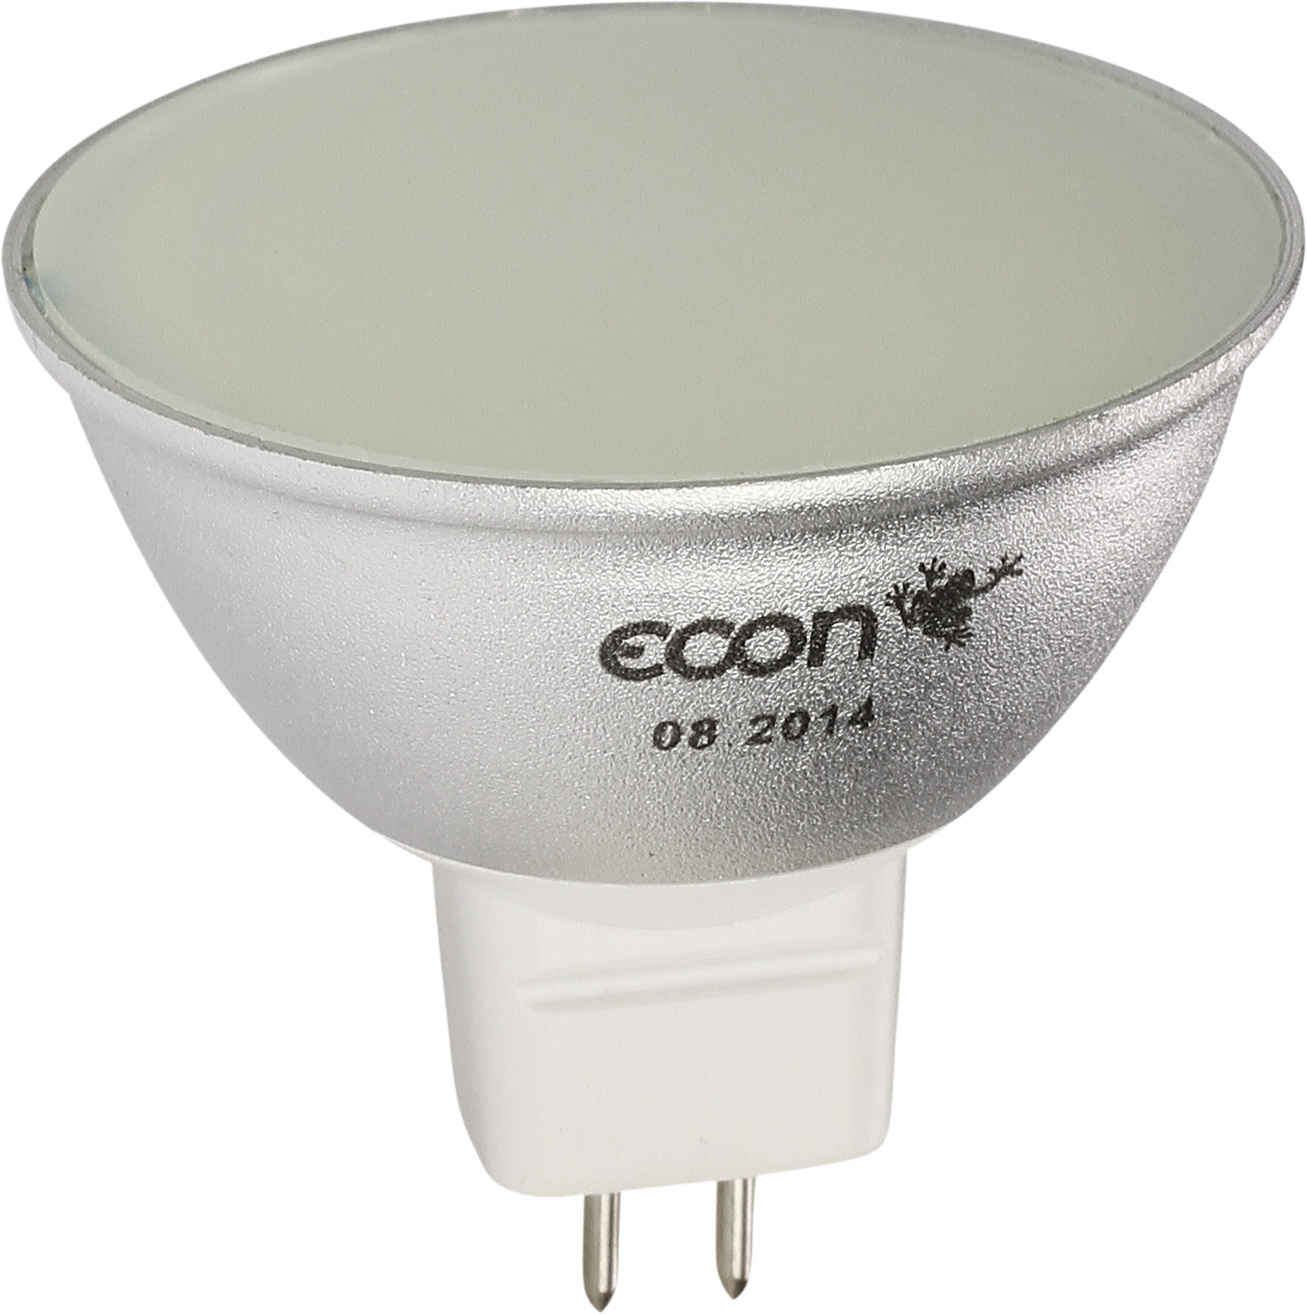 Лампа светодиодная Econ Led mr 5Вт gu5.3 3000k 12v лампочка econ led cnt 7w 3000k e27 b35 27121